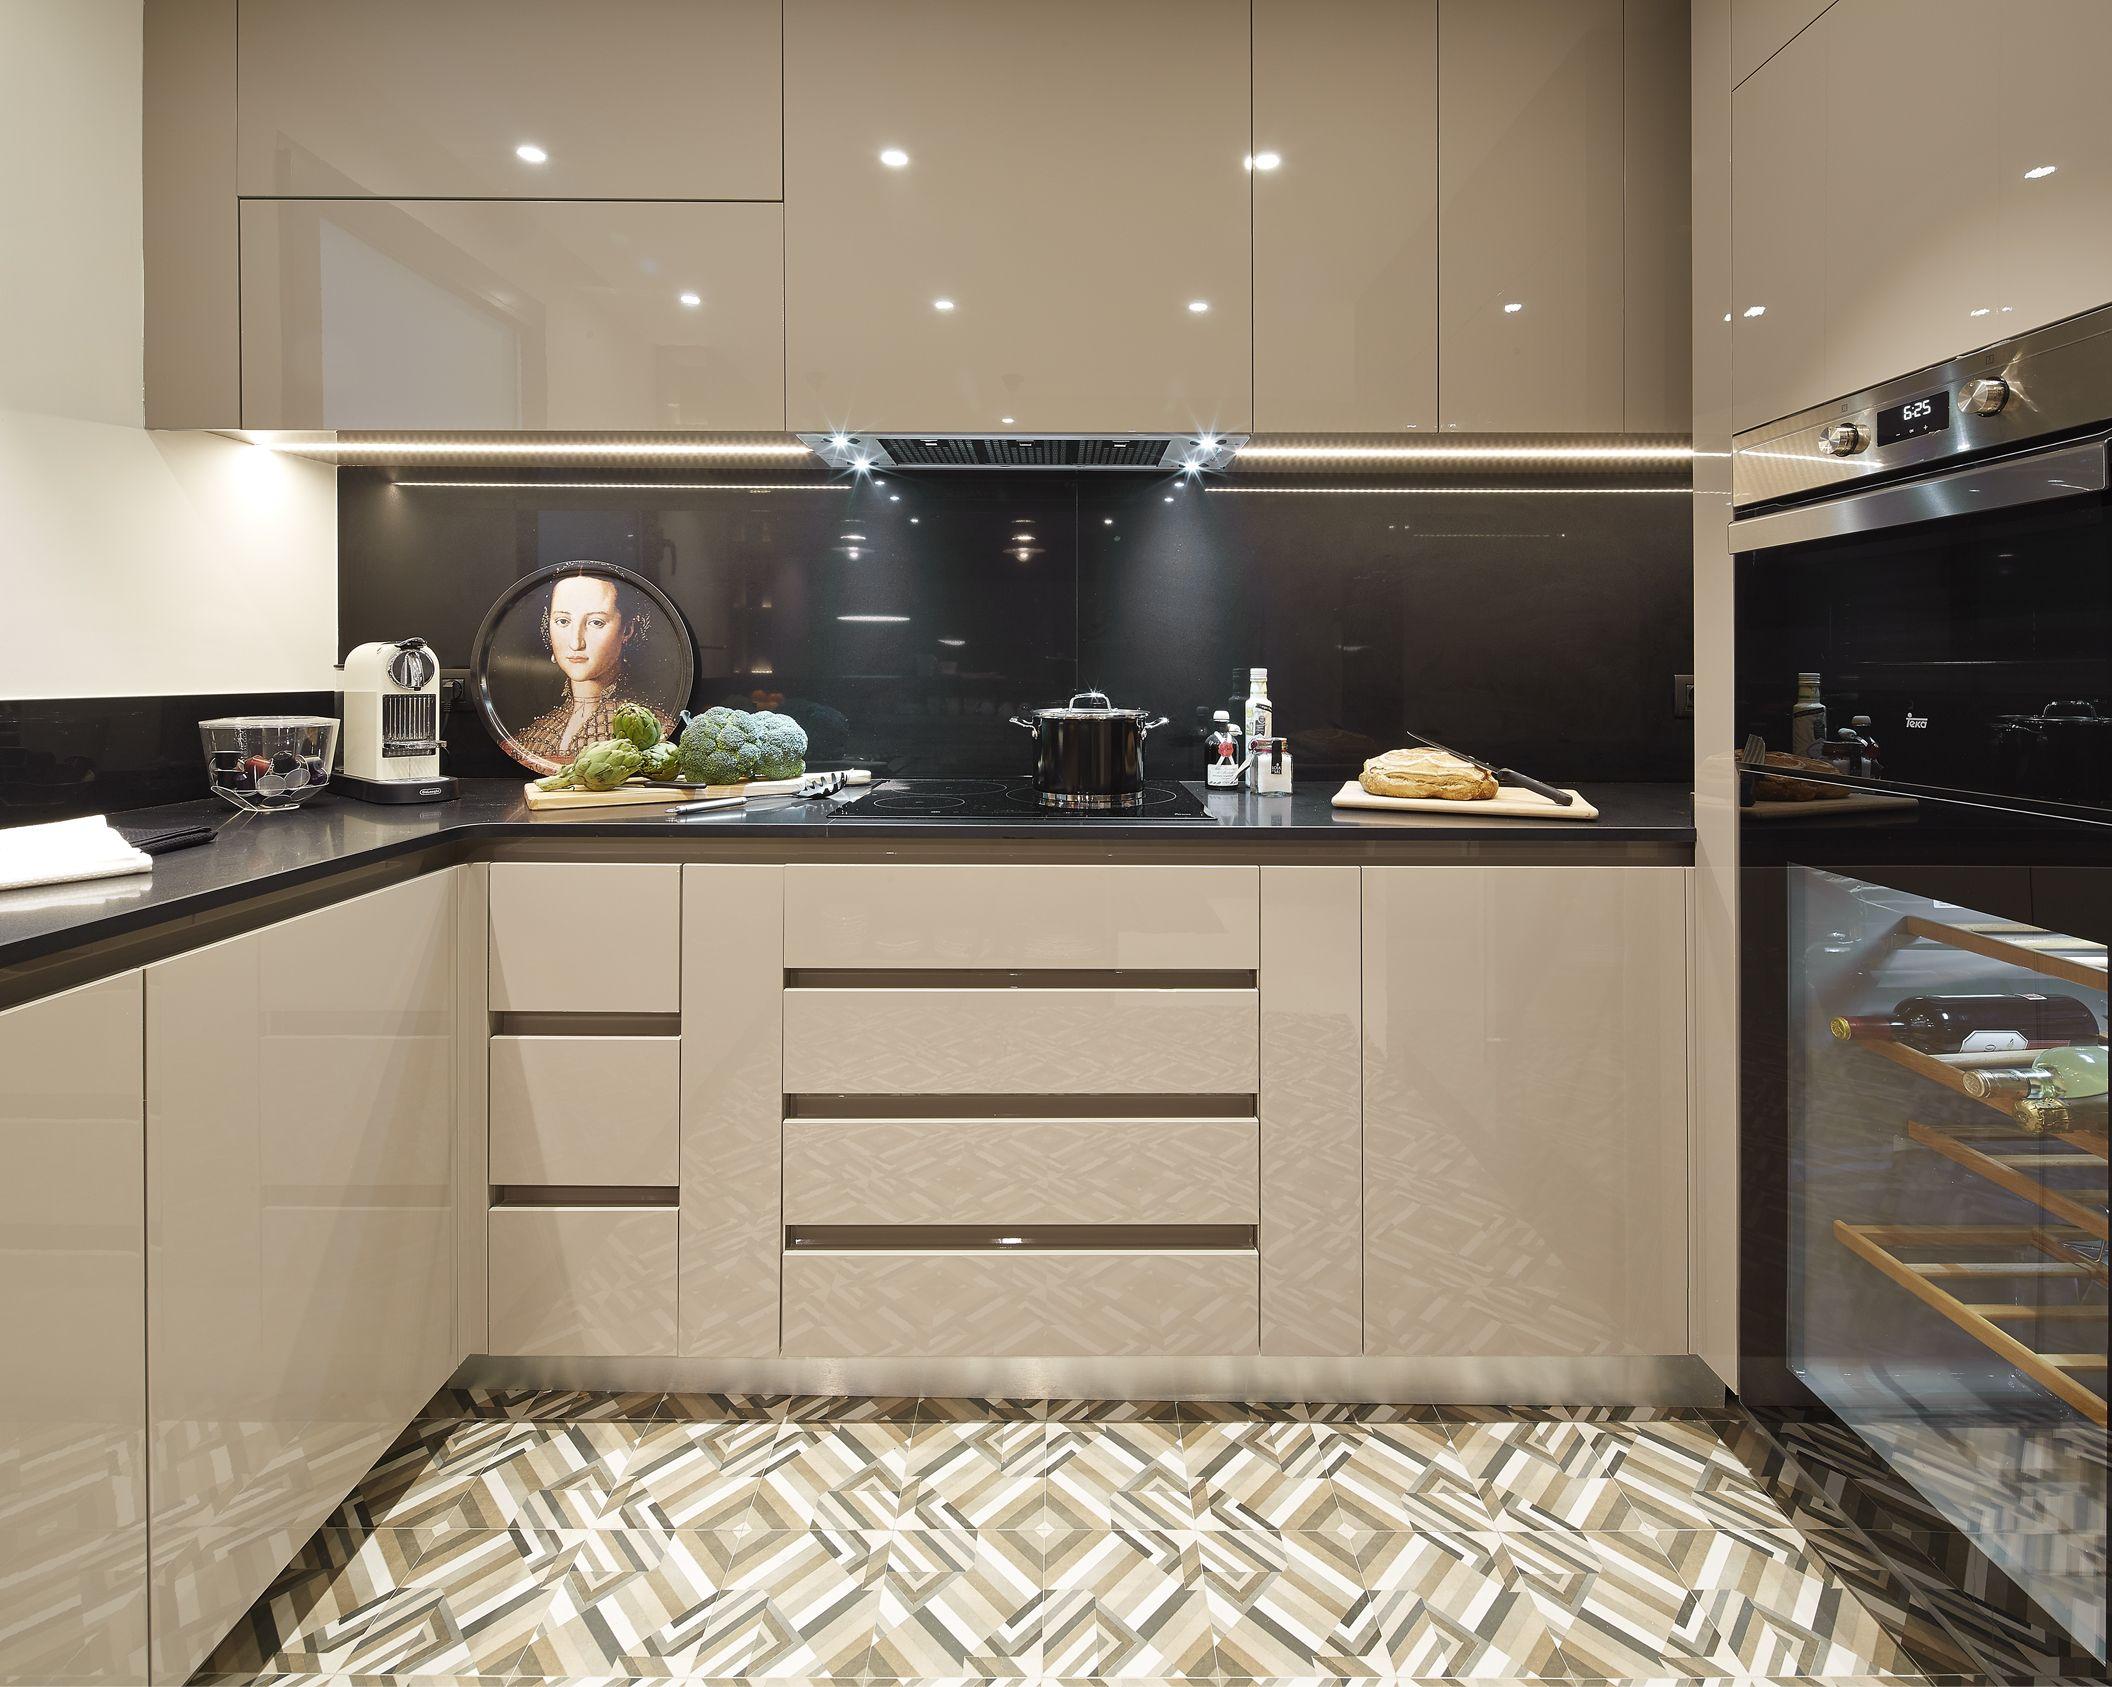 Molins interiors arquitectura interior interiorismo - Decoracion salon comedor ...